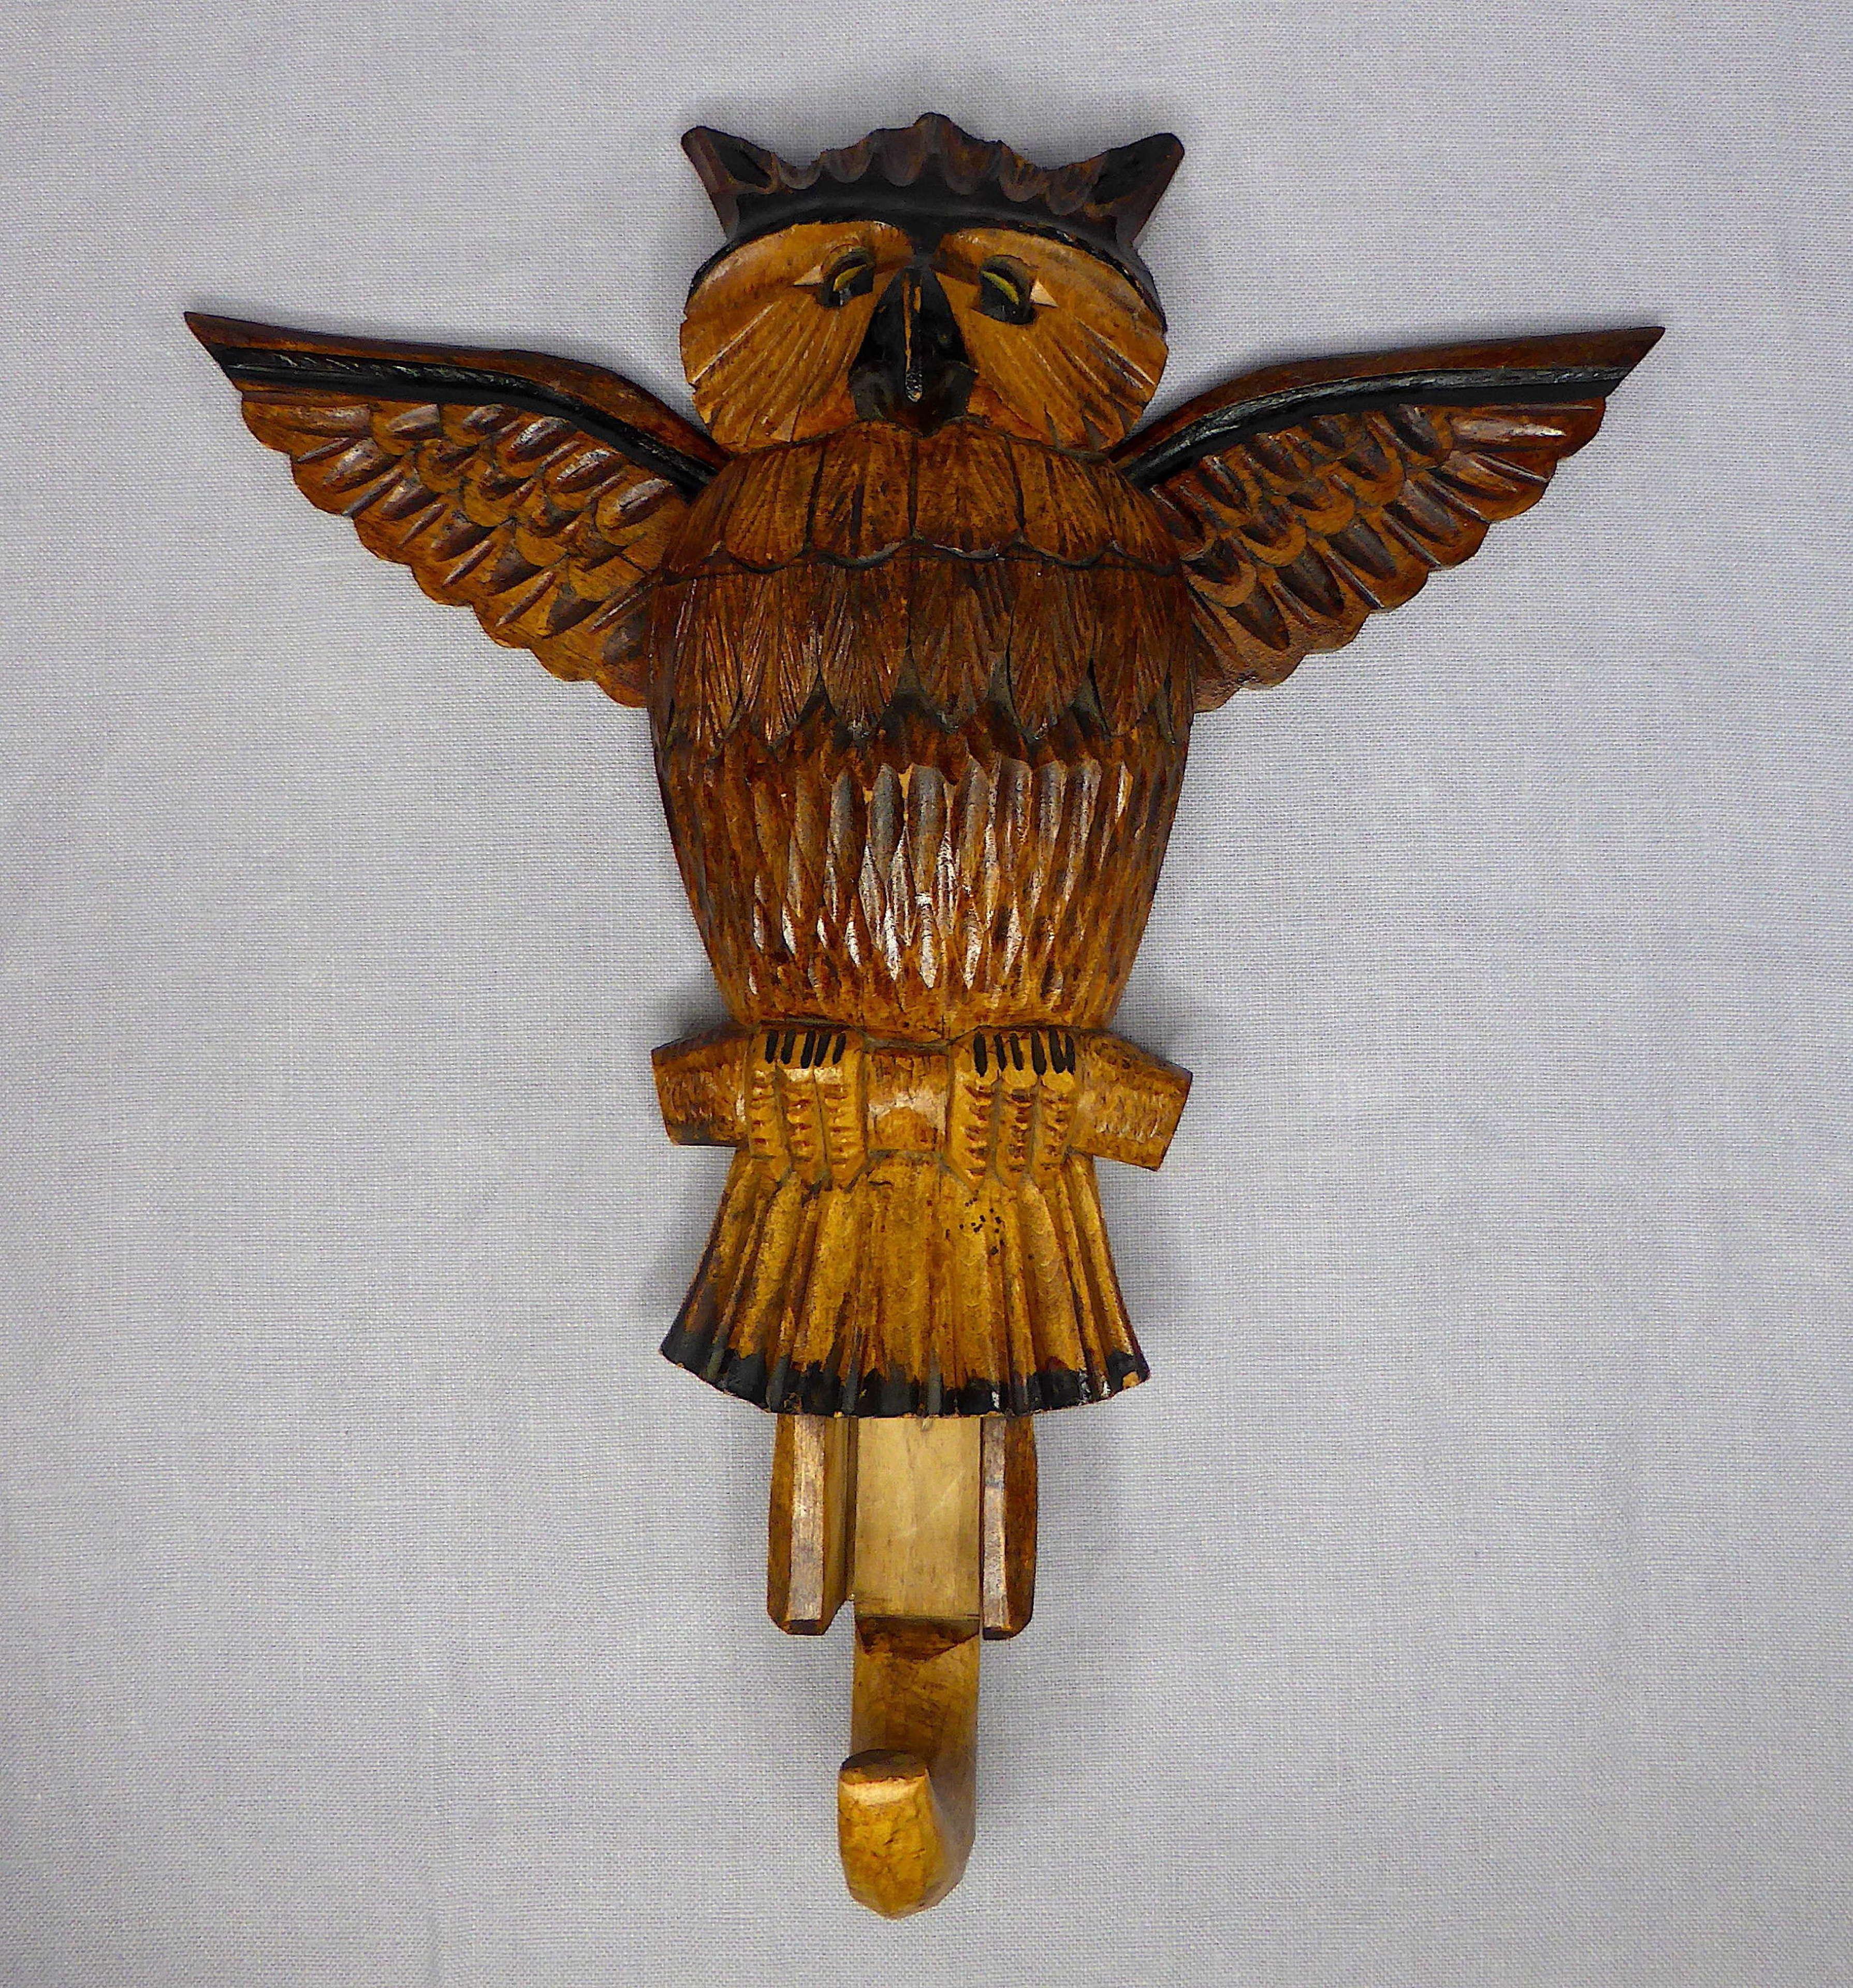 Articulated Owl Hook